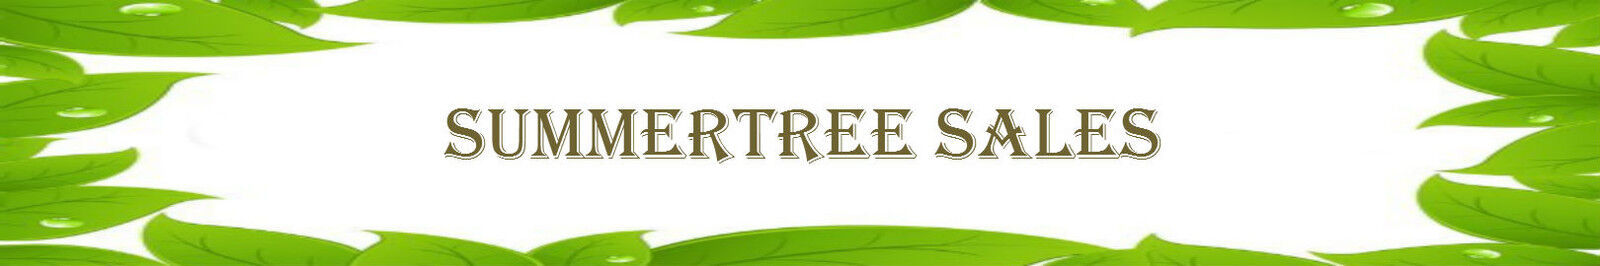 Summertree Sales